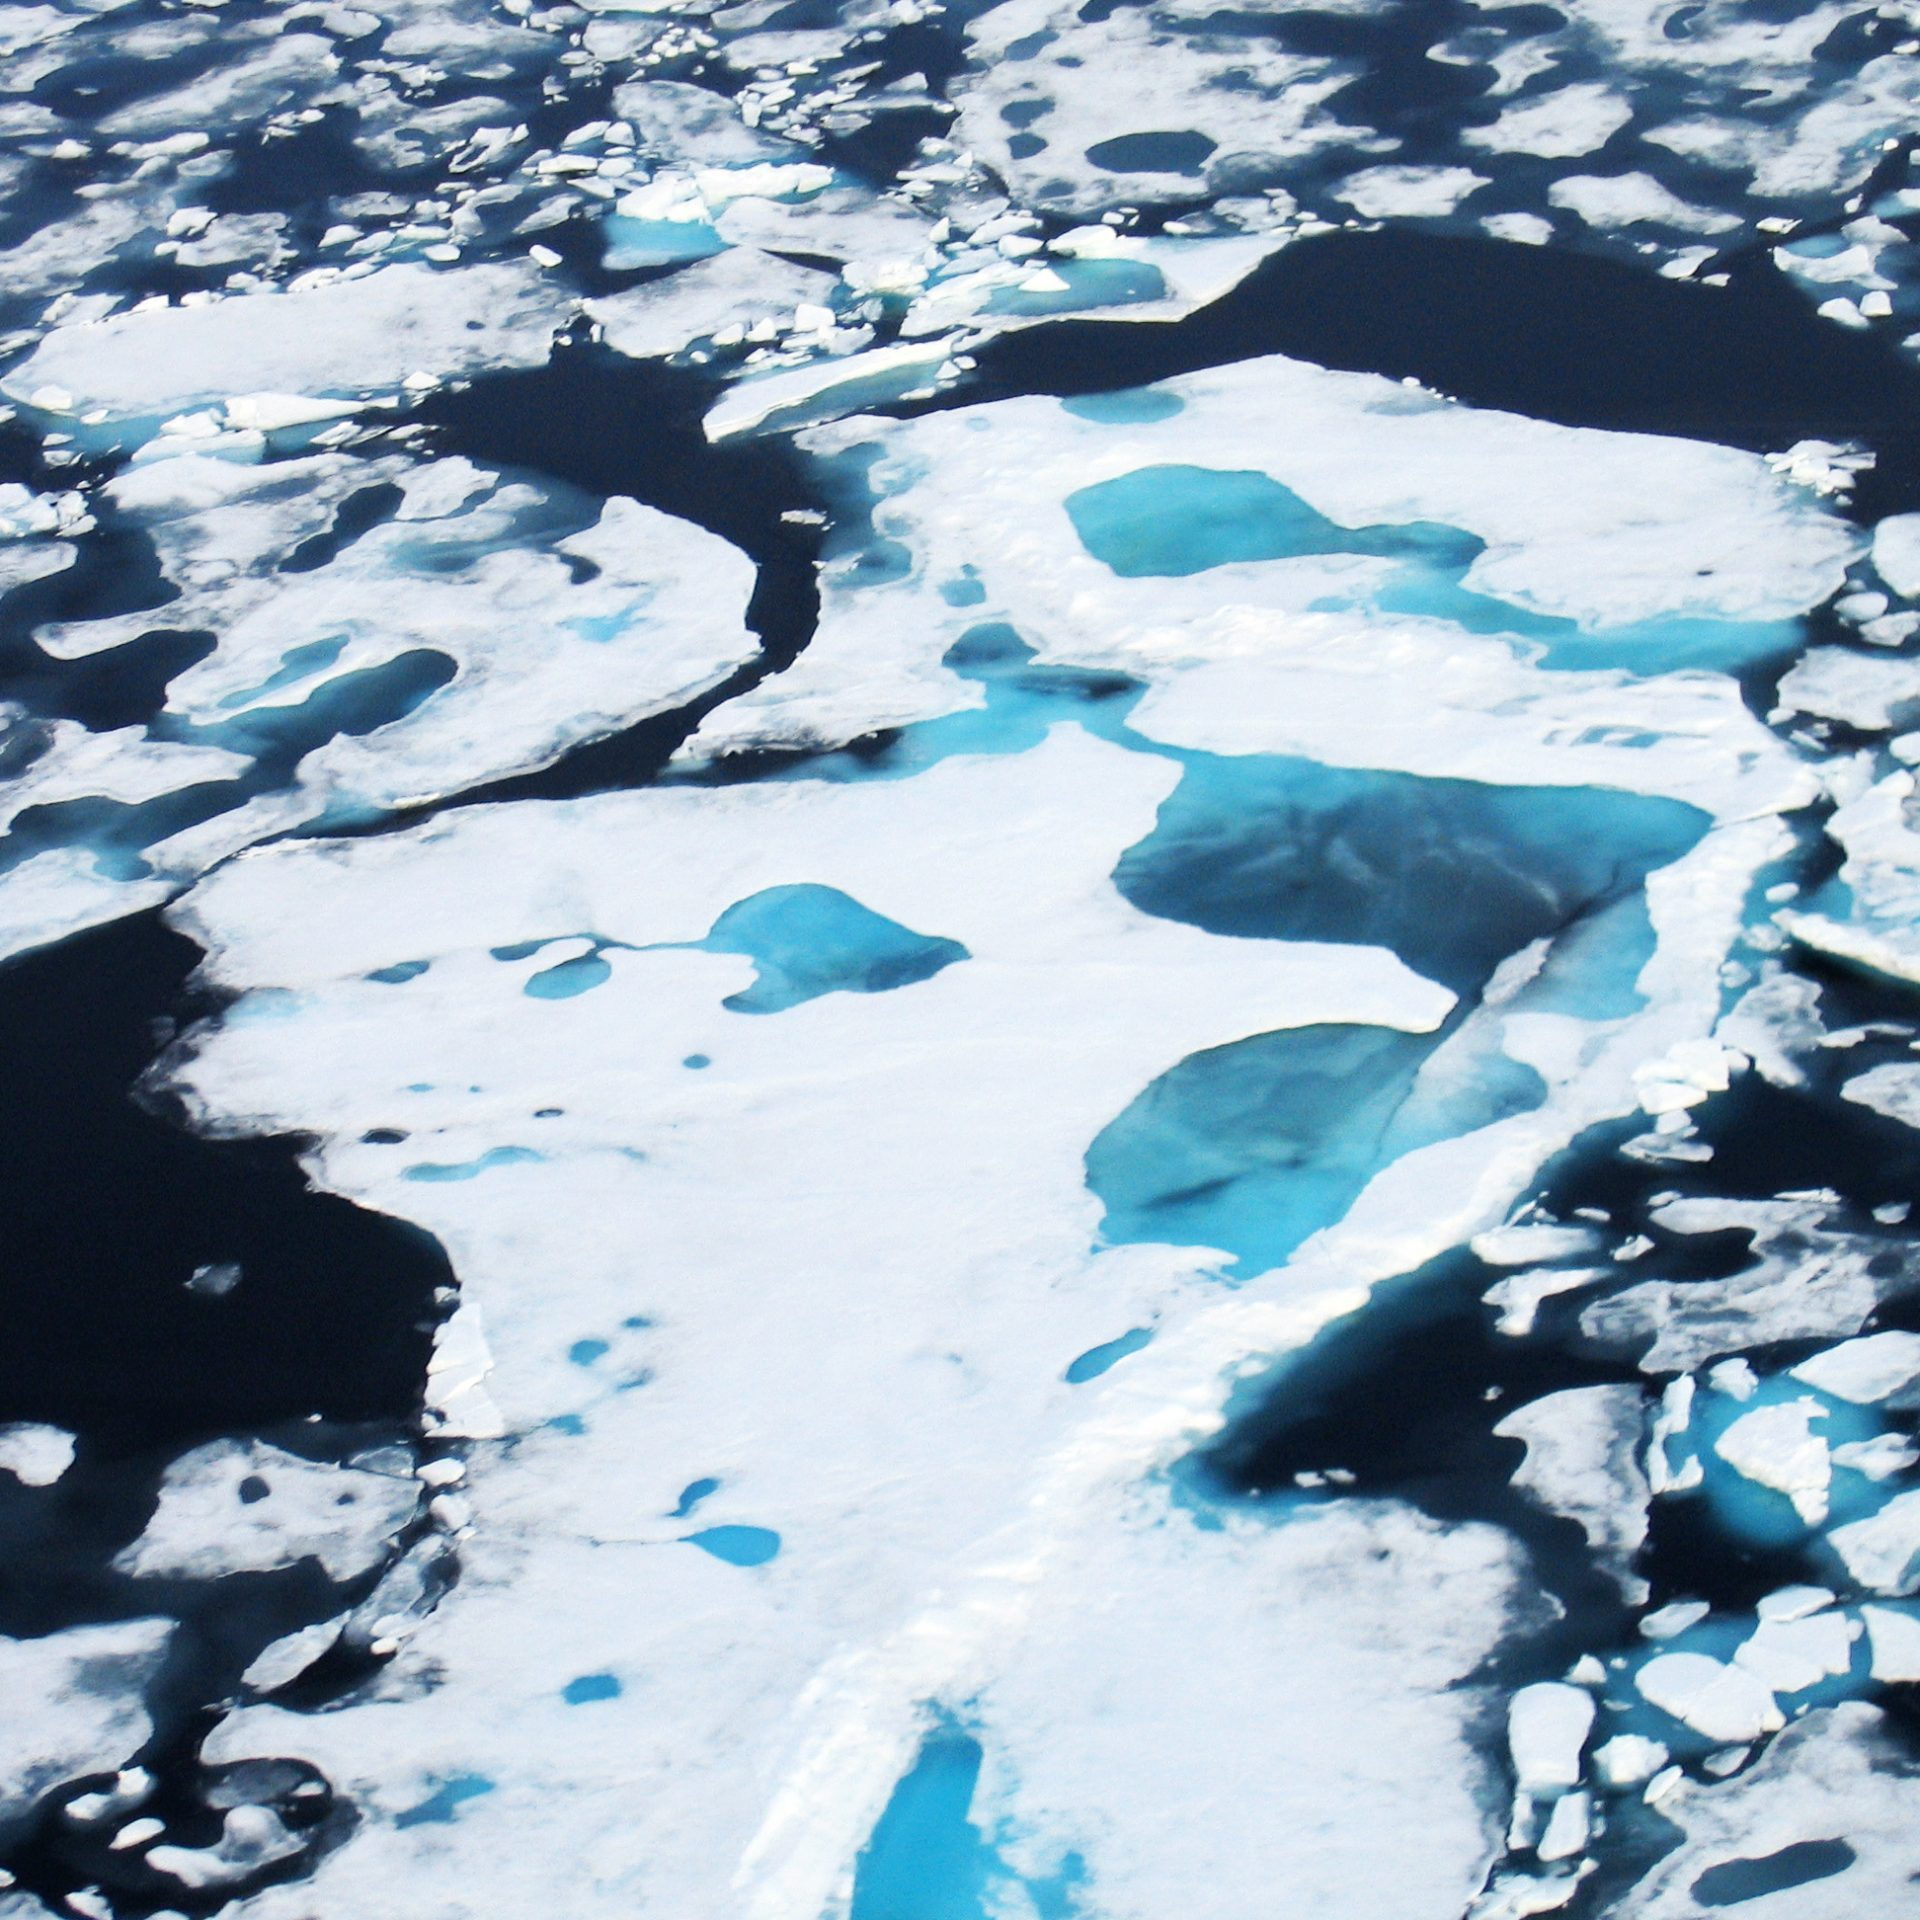 Aerial-View-Broken-Ice